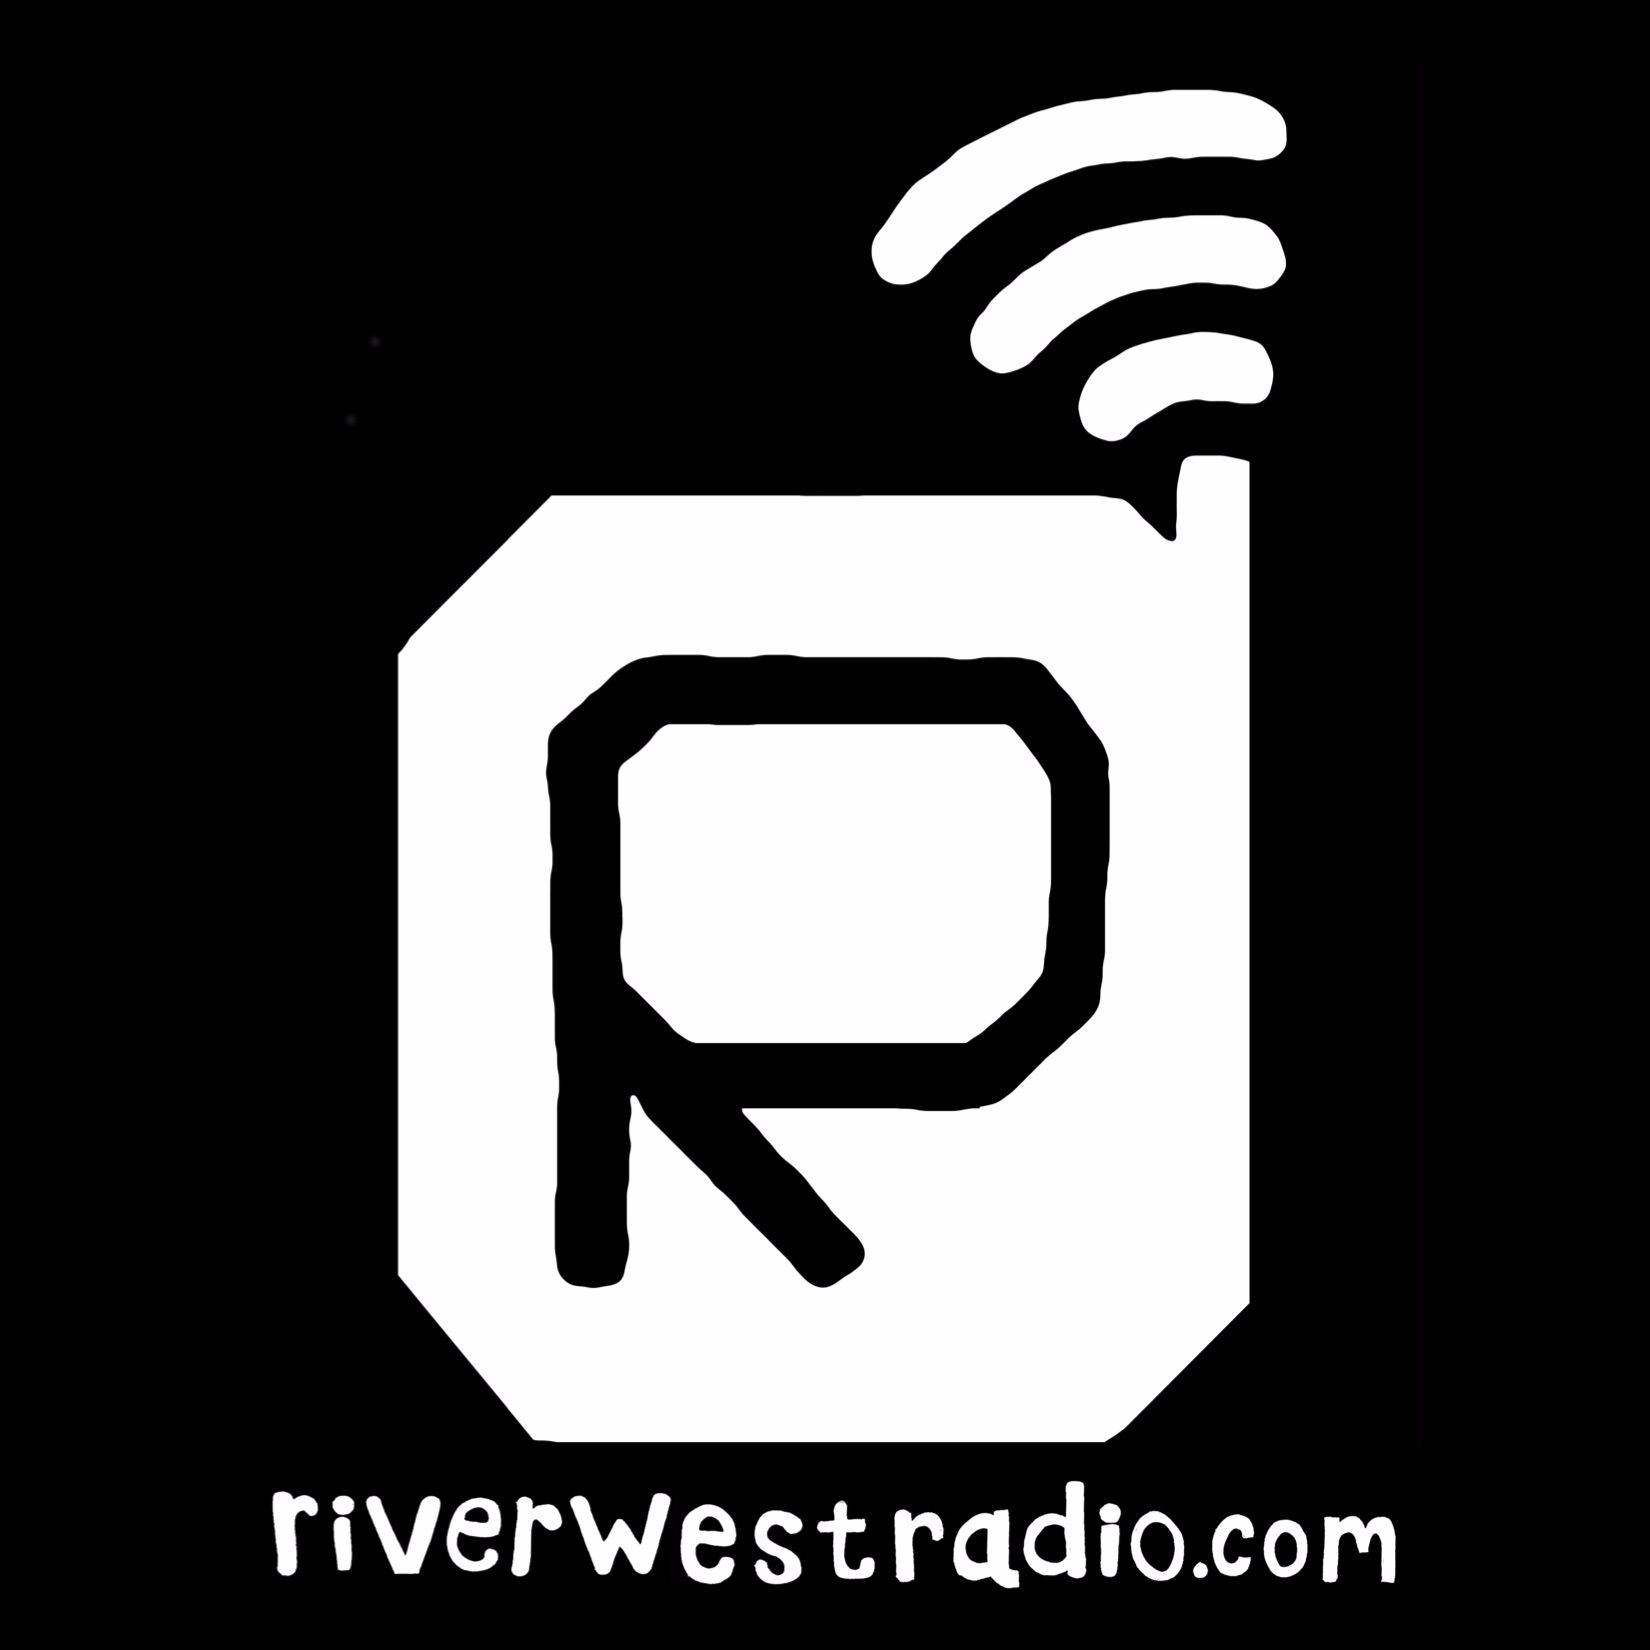 riverwest-radio-logo.jpg